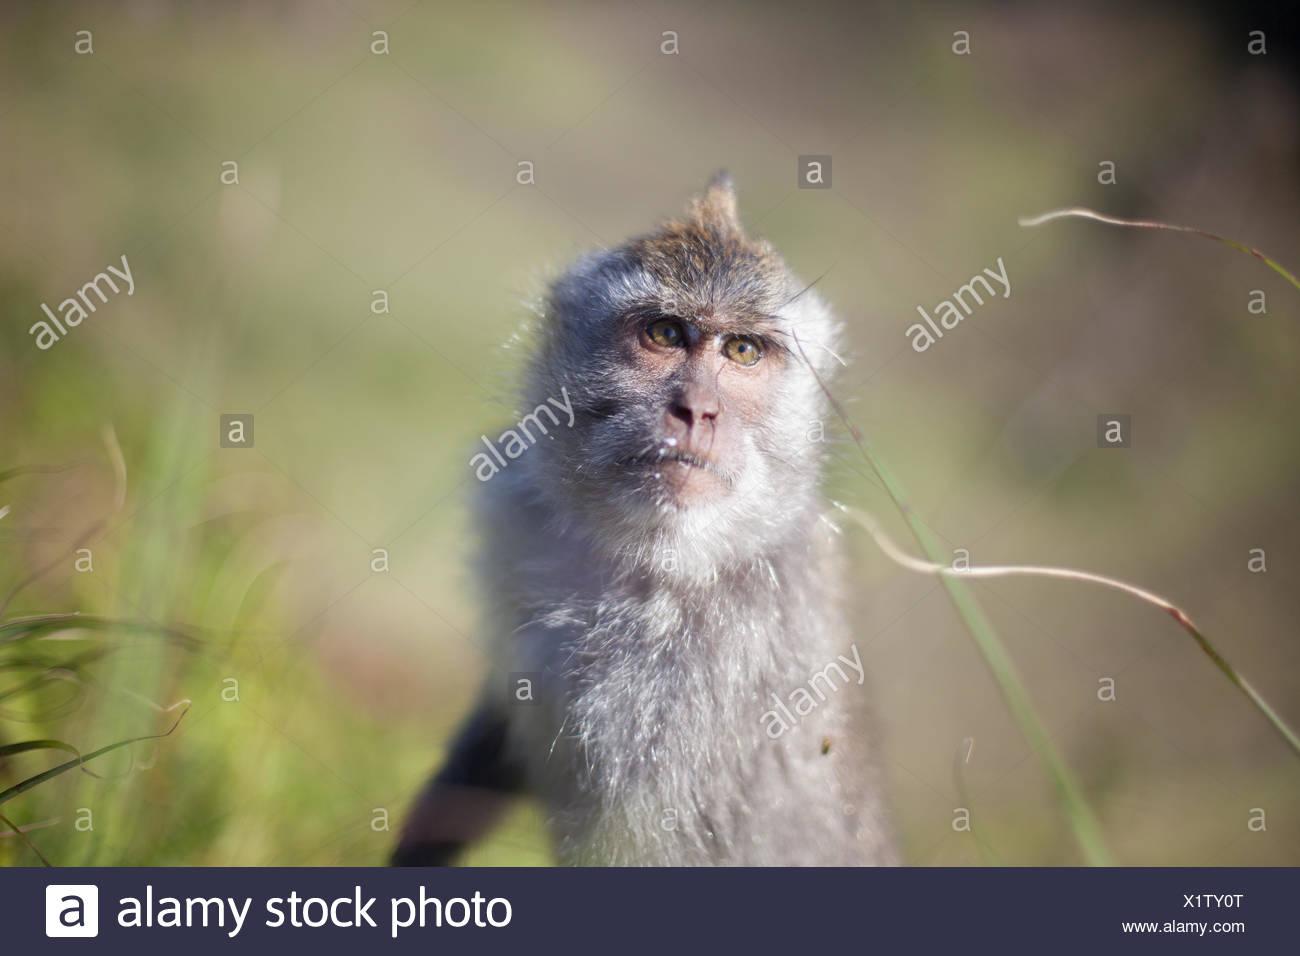 Portrait Of A Monkey - Stock Image